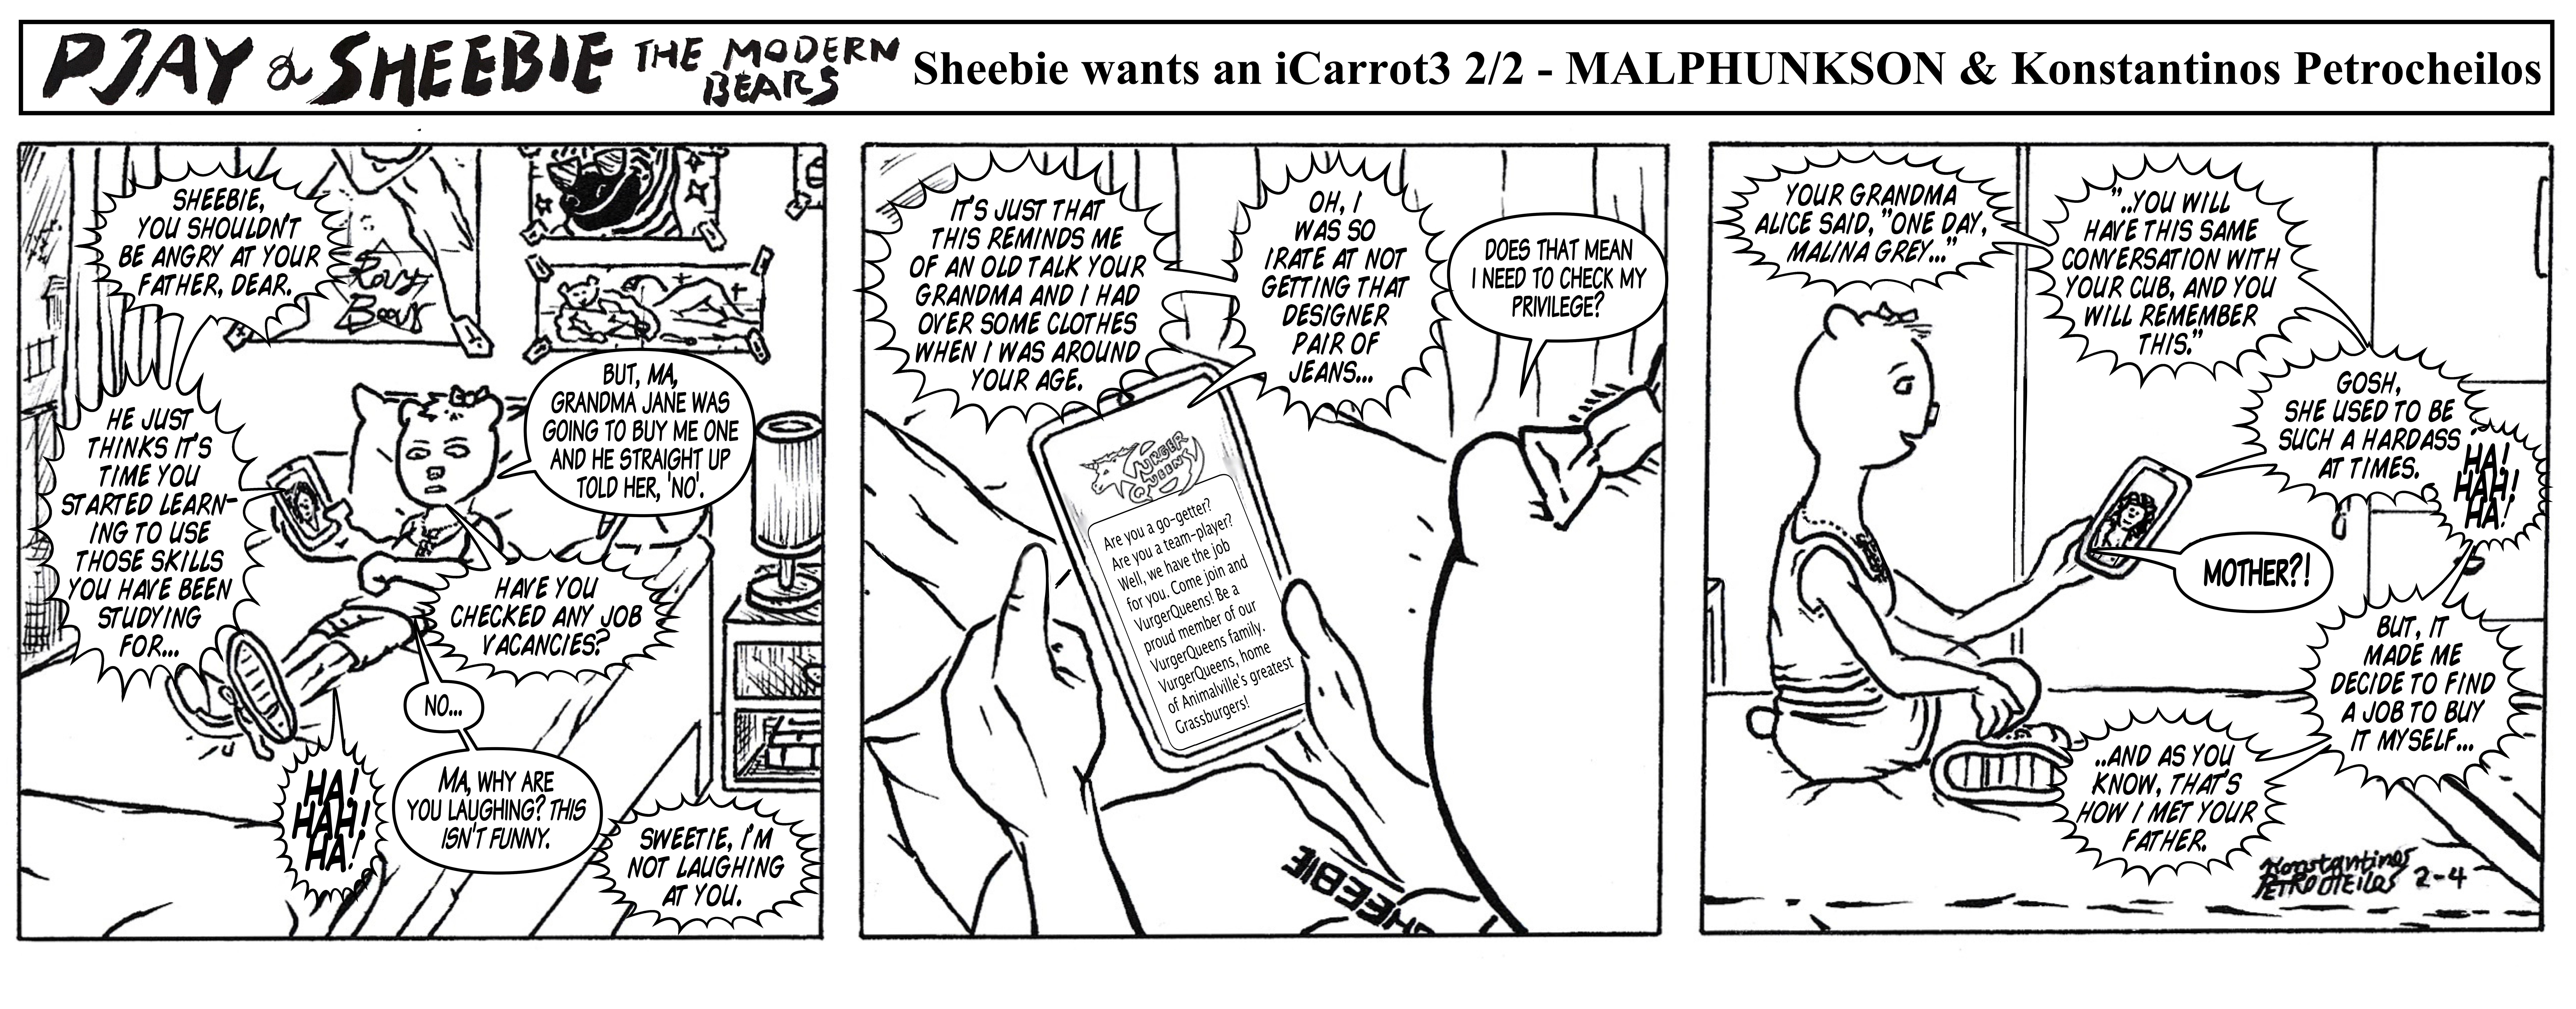 Sheebie wants an iCarrot3 2/2